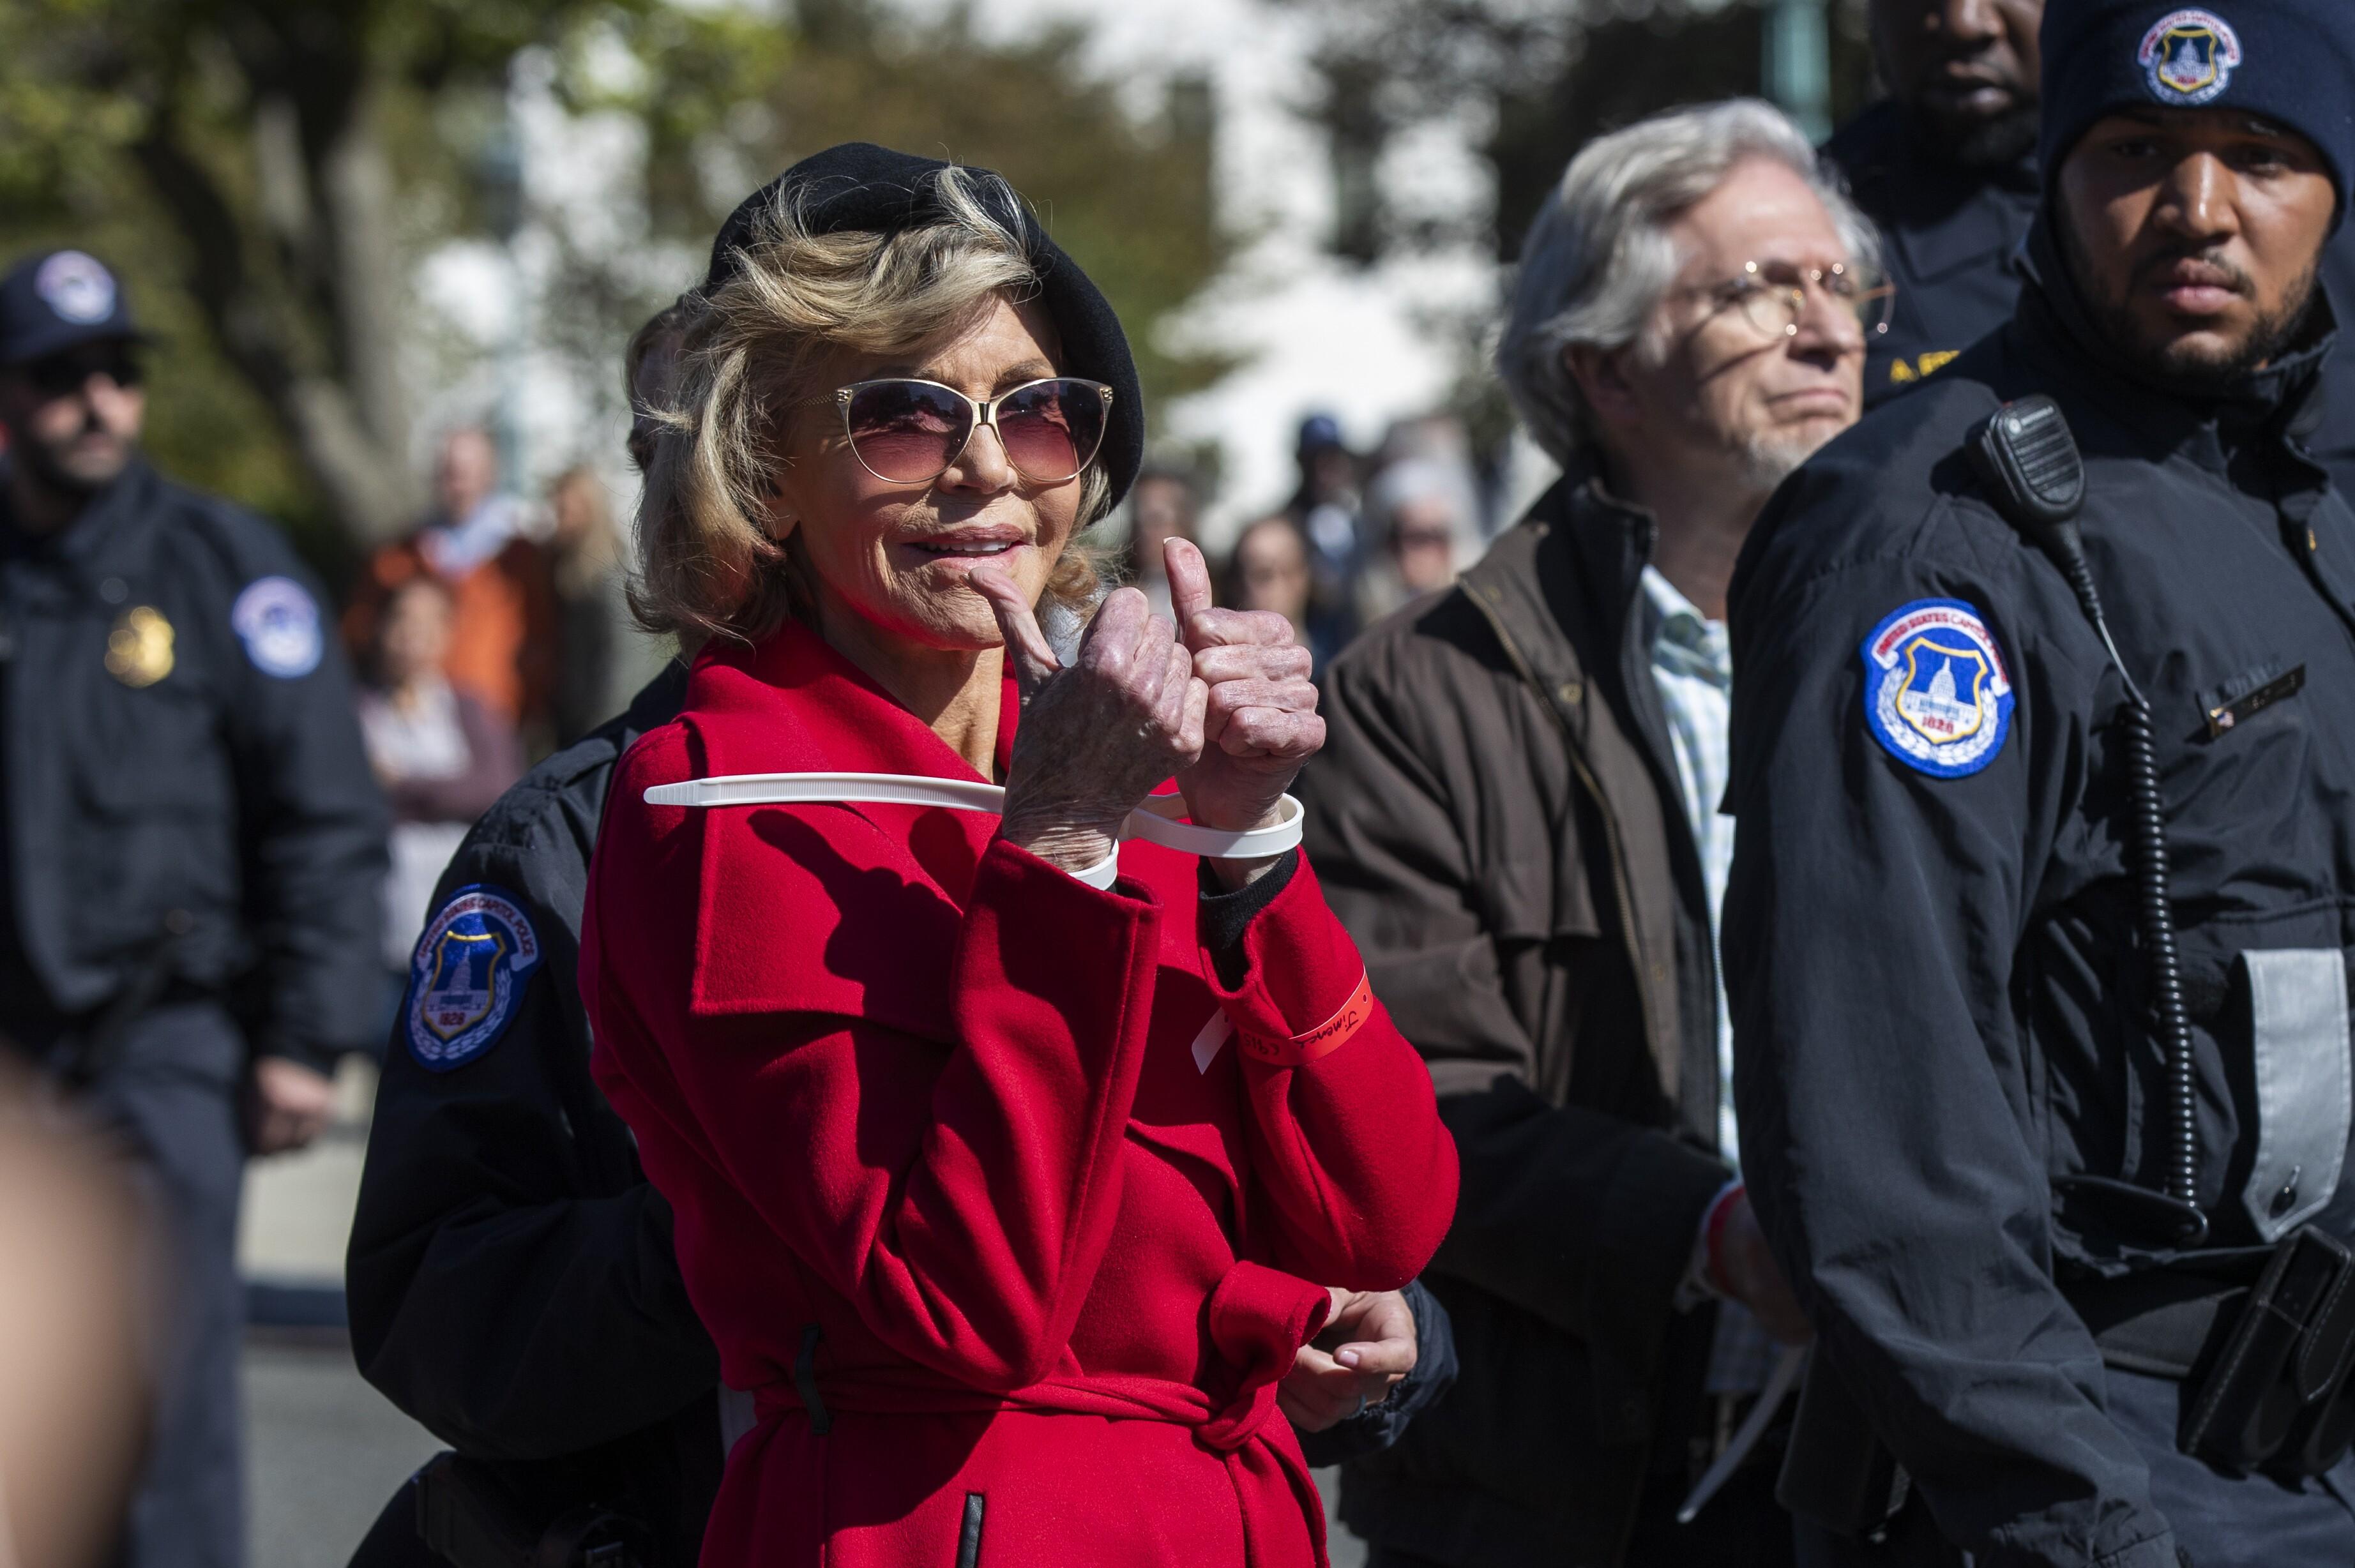 Liberal Media Scream: Jane Fonda wants 'Nuremberg trials' for energy executives